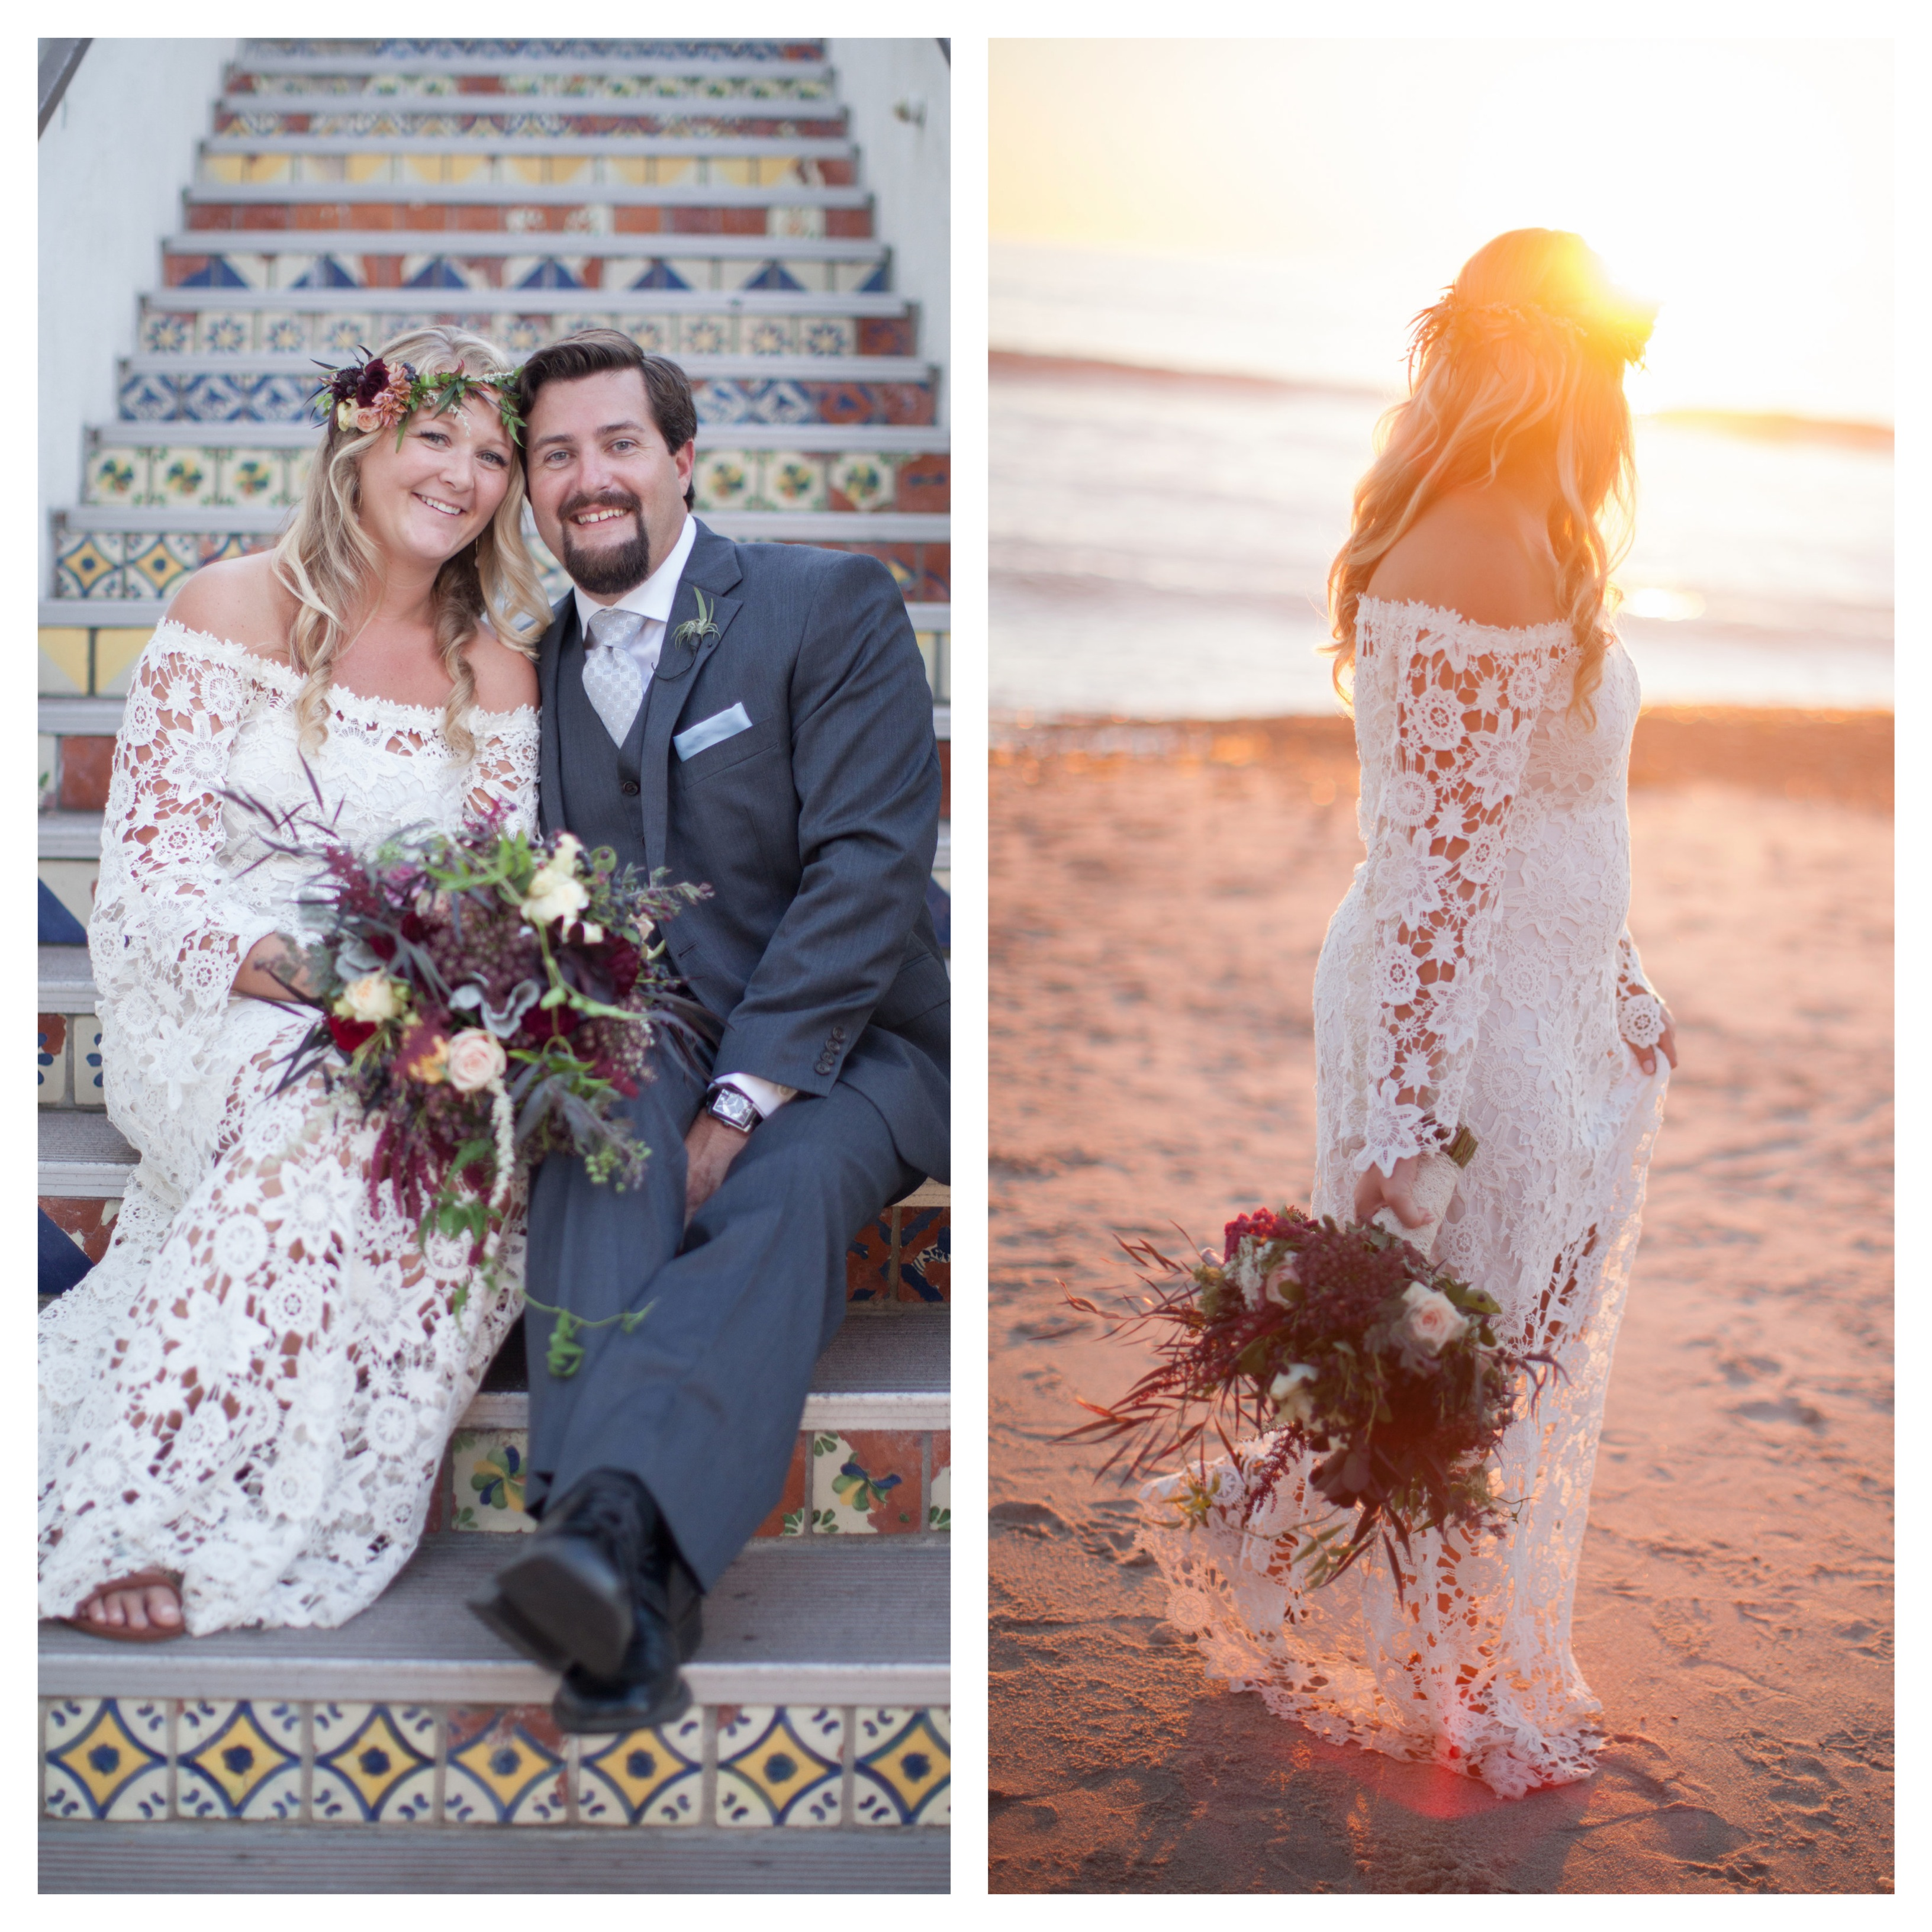 Bohemian Inspired California Wedding At Holly Farm: Bohemian Rustic Wedding Captured At The Casino San